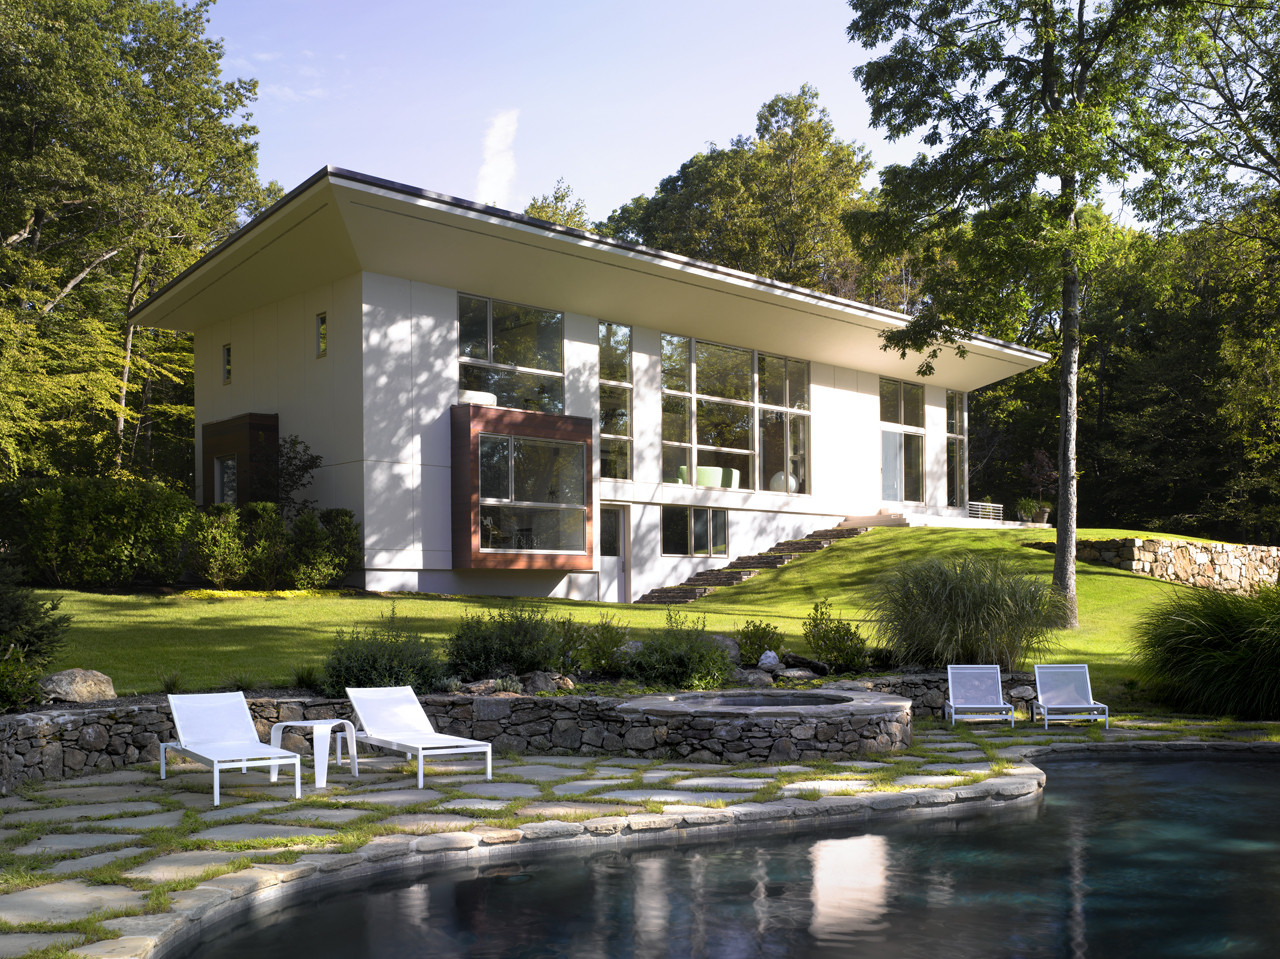 Pawling House / SPG Architects, Courtesy of Tim Street-Porter